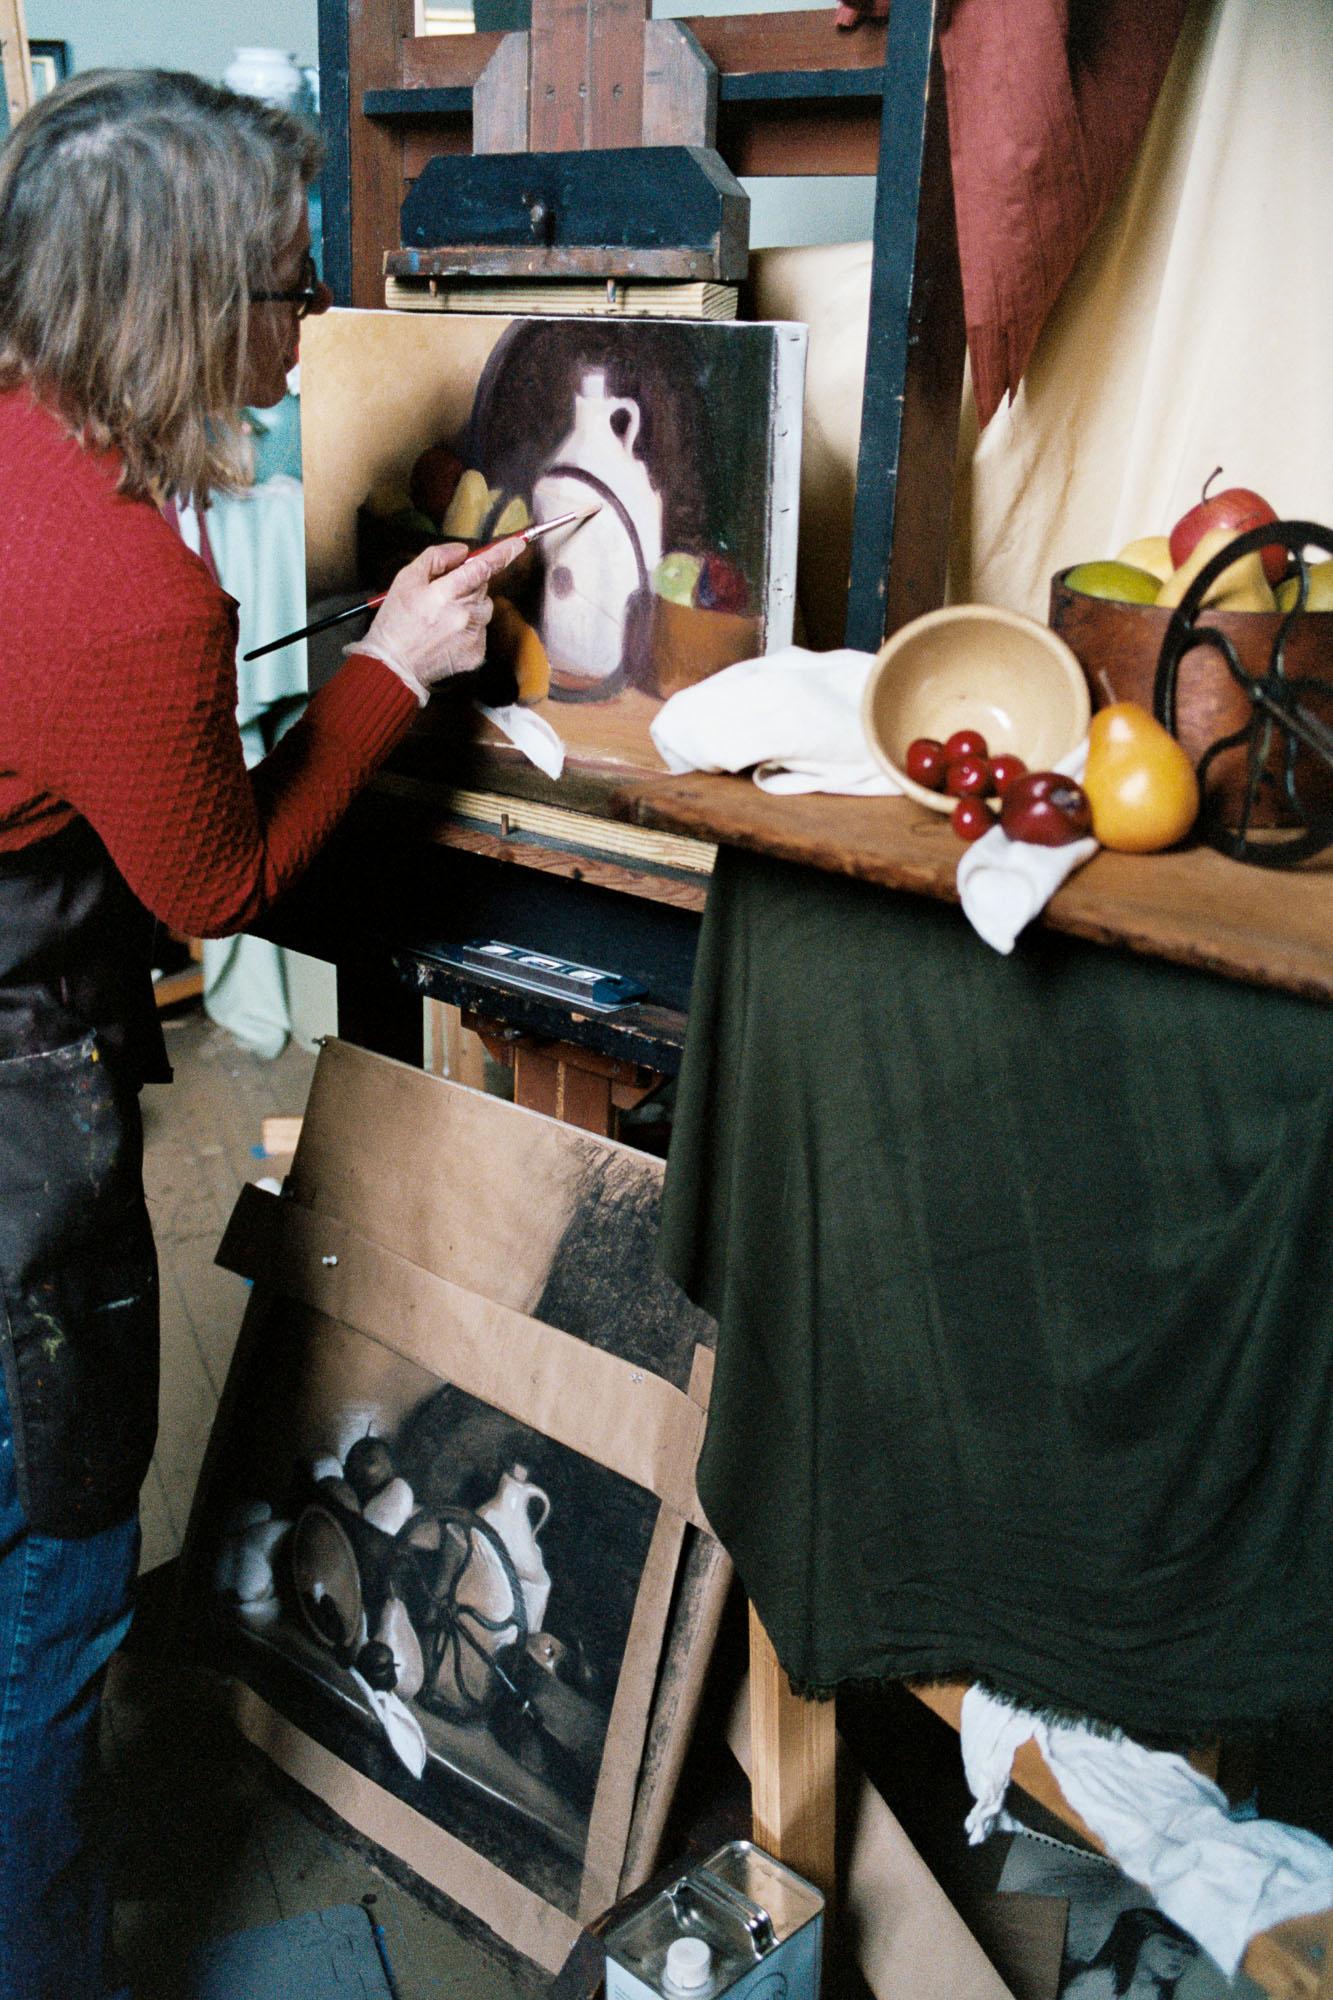 Ingbretson_atelier_by_Lomanno-8.jpg